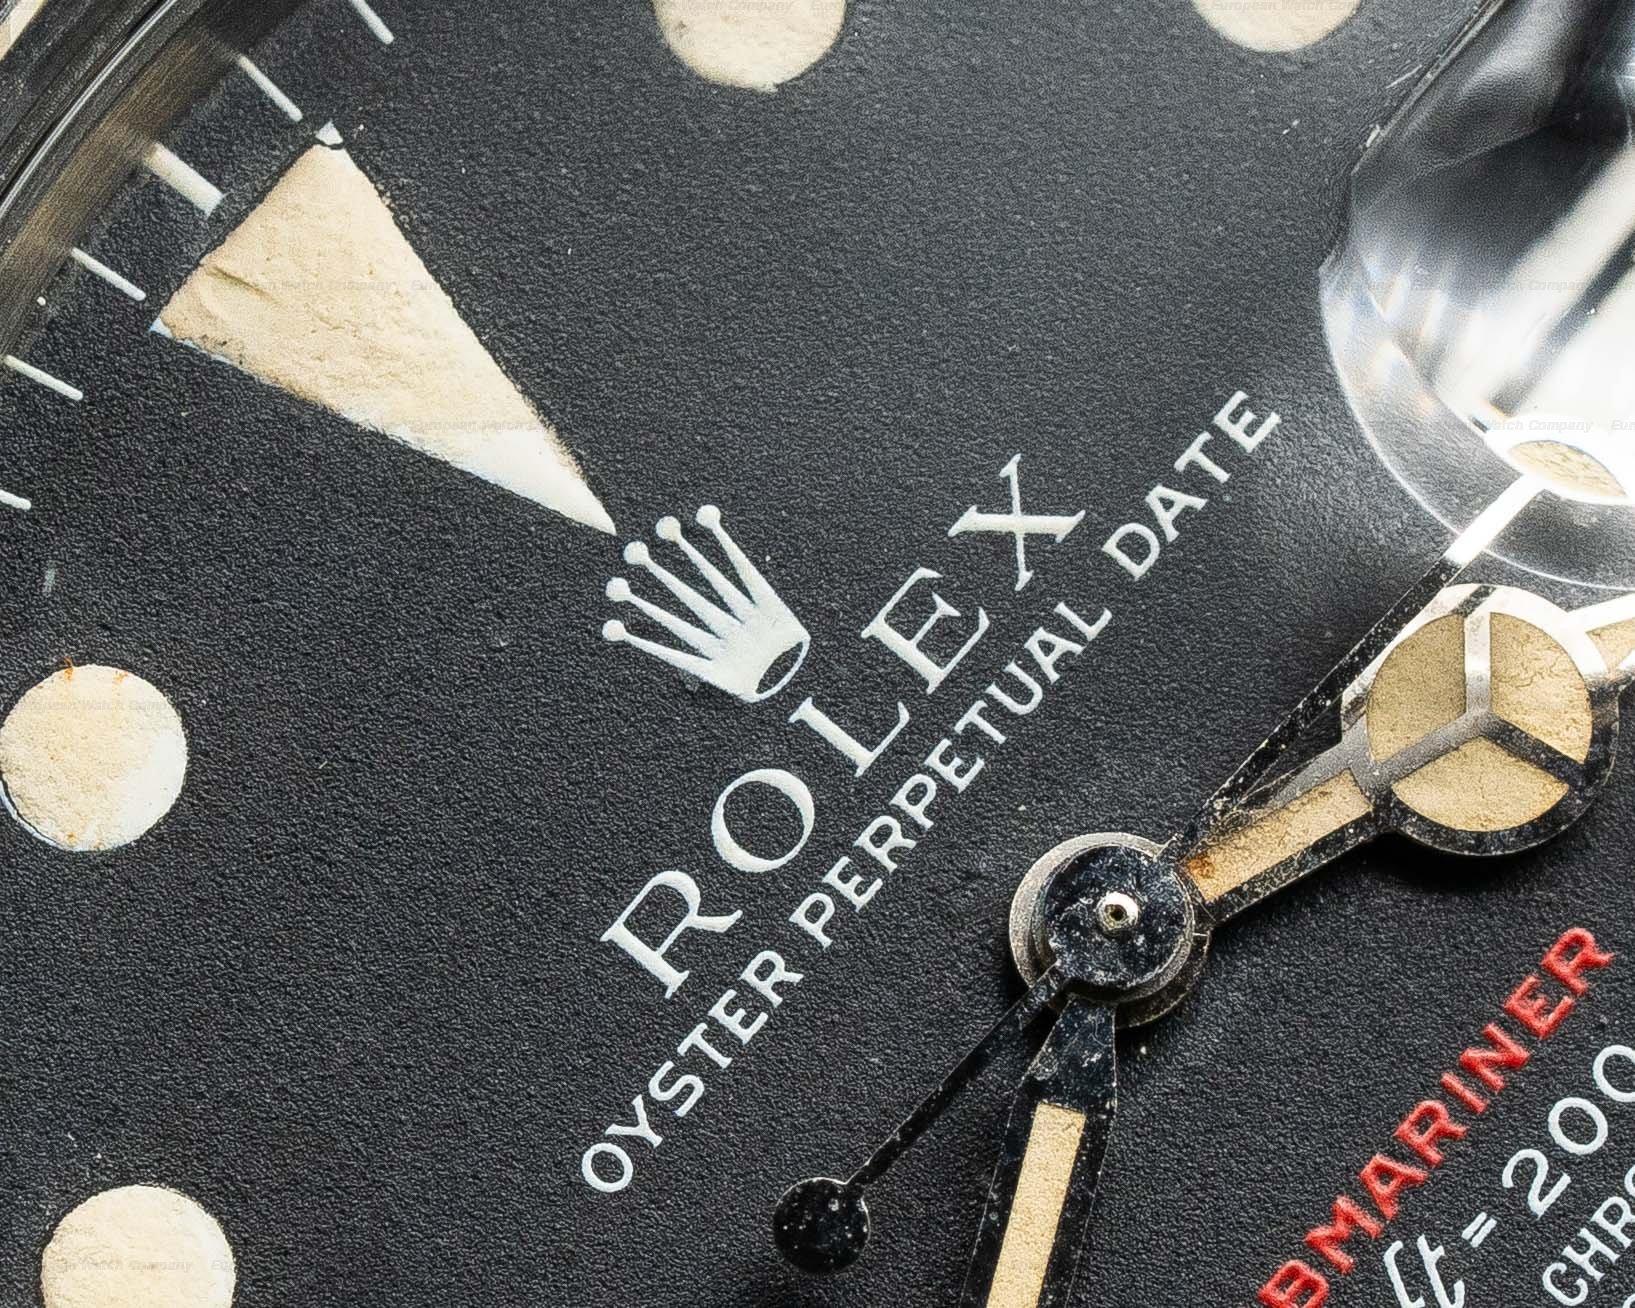 Rolex 1680 RED Submariner RED MK IV Circa 1973 SS